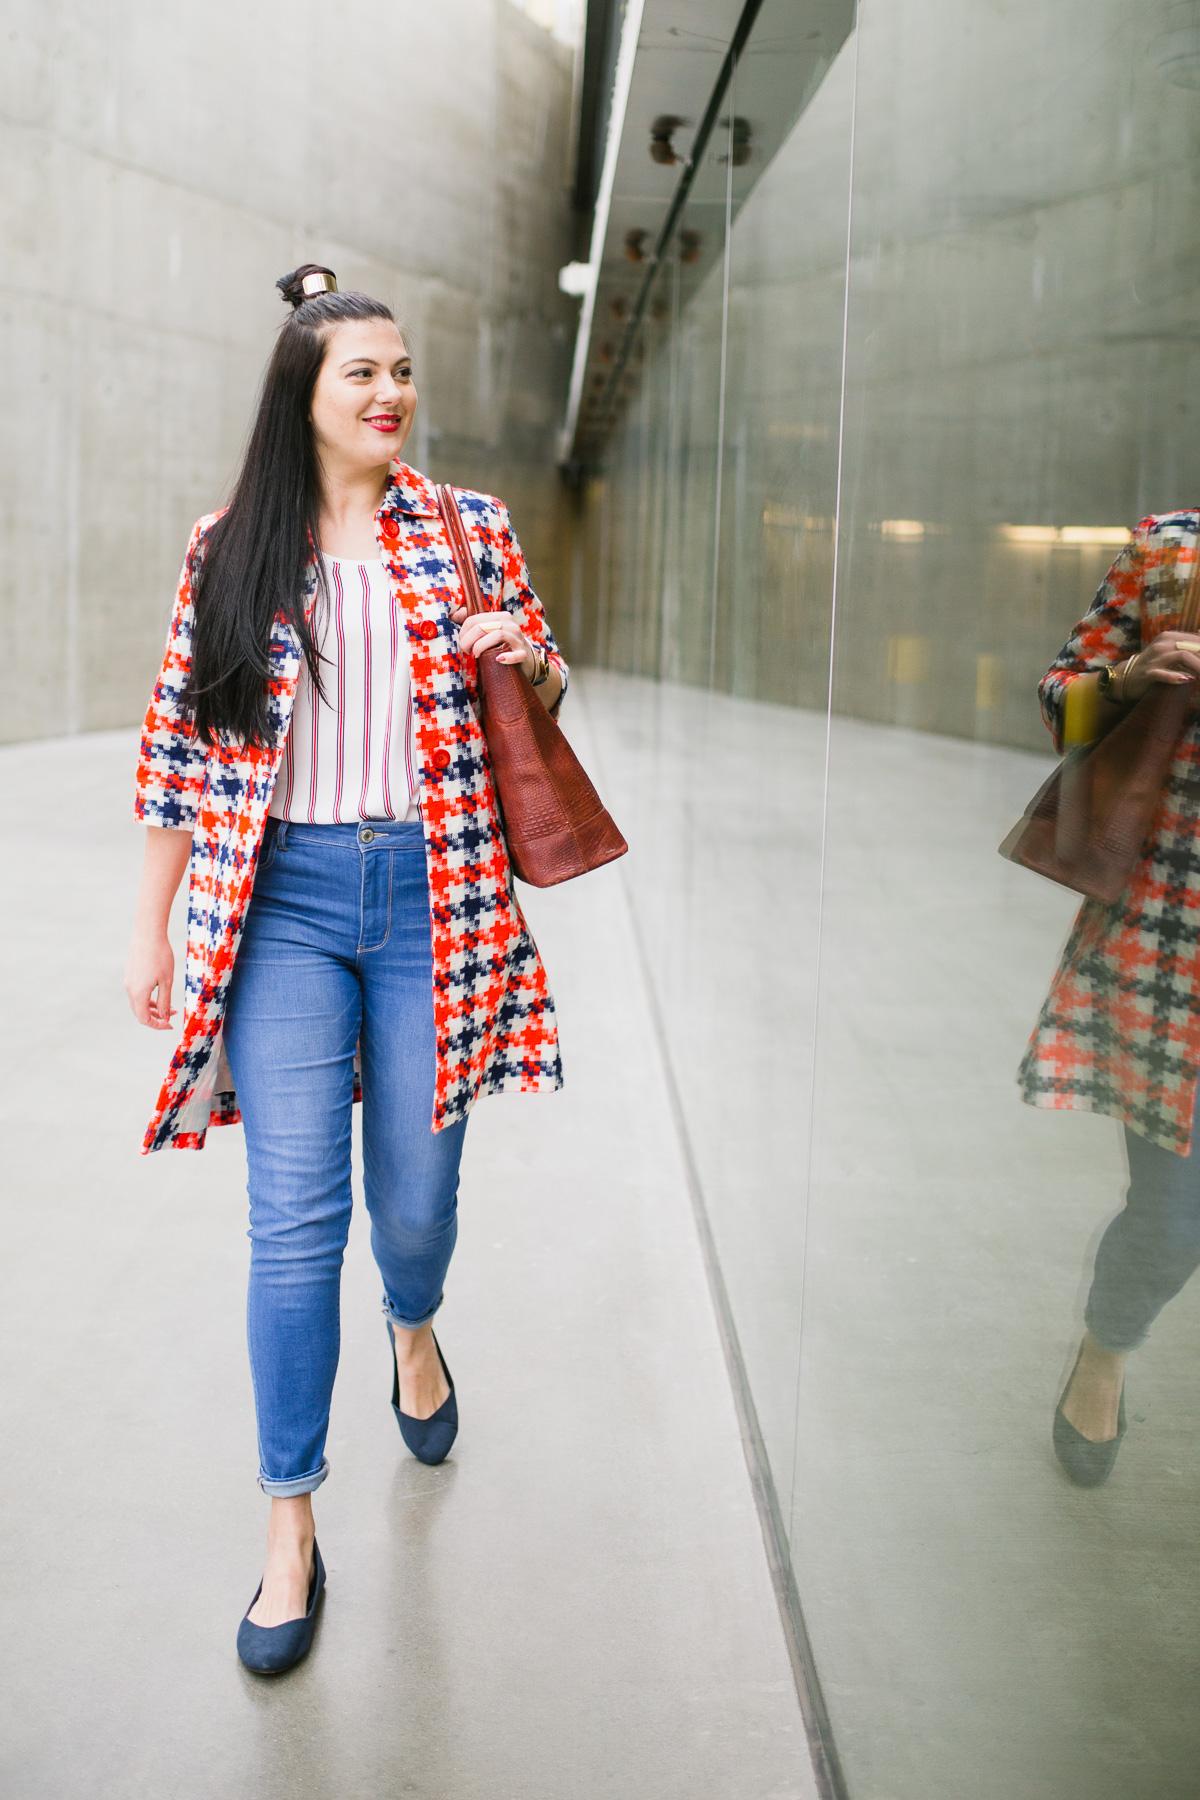 AN_PnP_Fashion-Checkcoat004.jpg